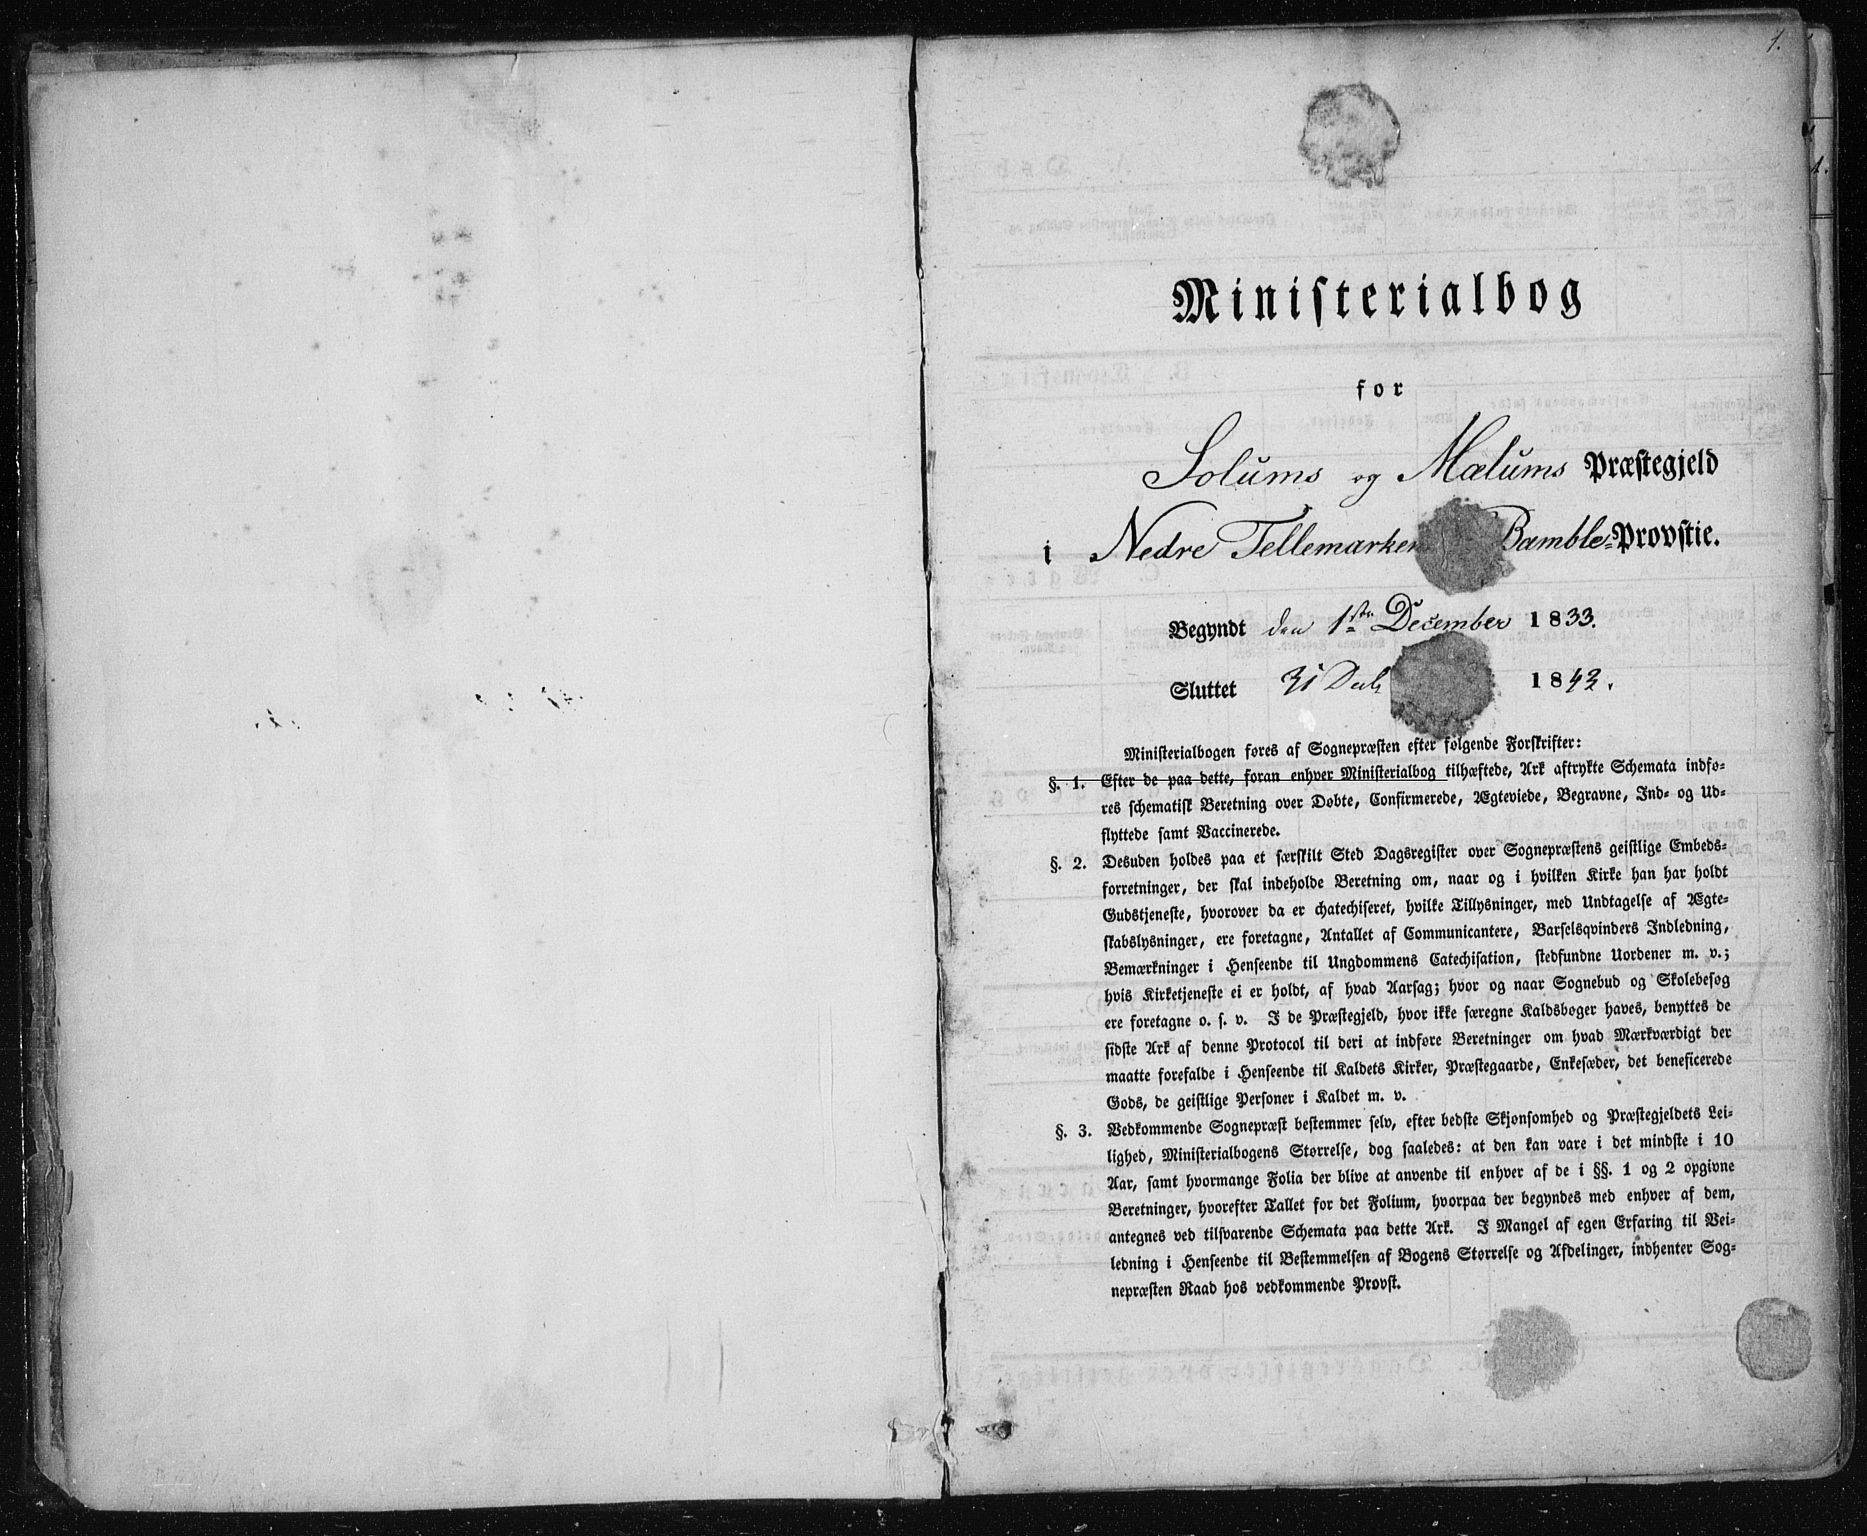 SAKO, Solum kirkebøker, F/Fa/L0005: Ministerialbok nr. I 5, 1833-1843, s. 1